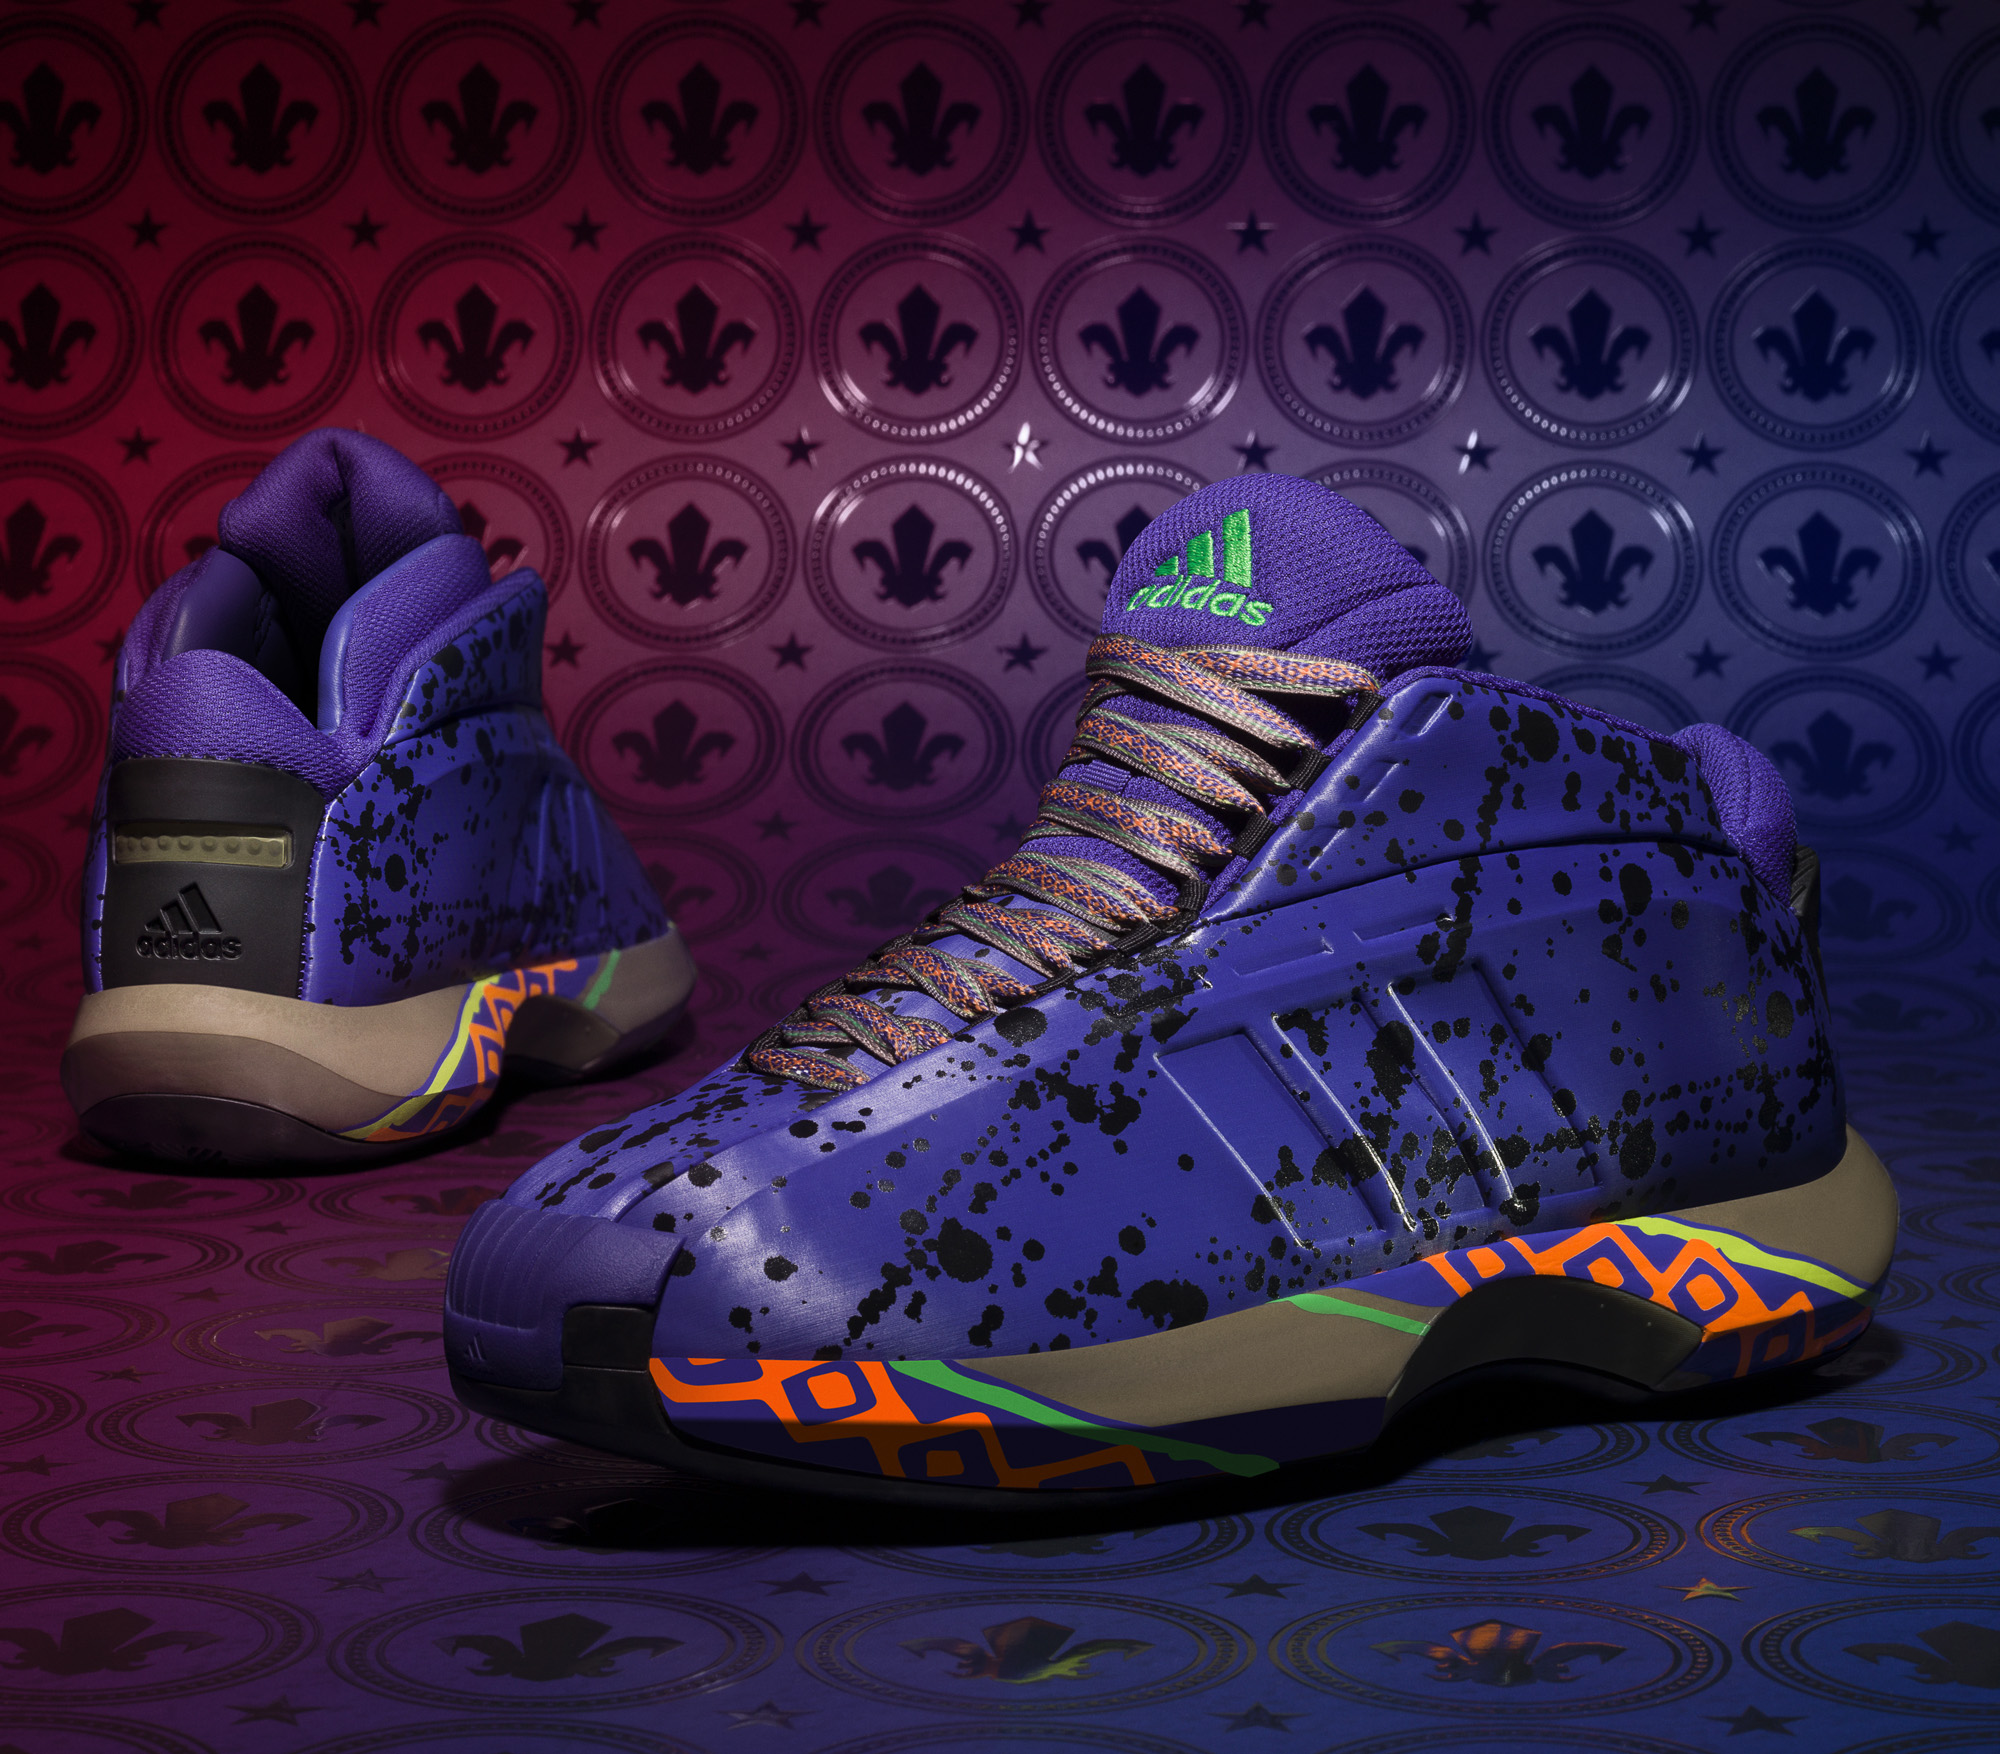 new adidas basketball shoes 2014